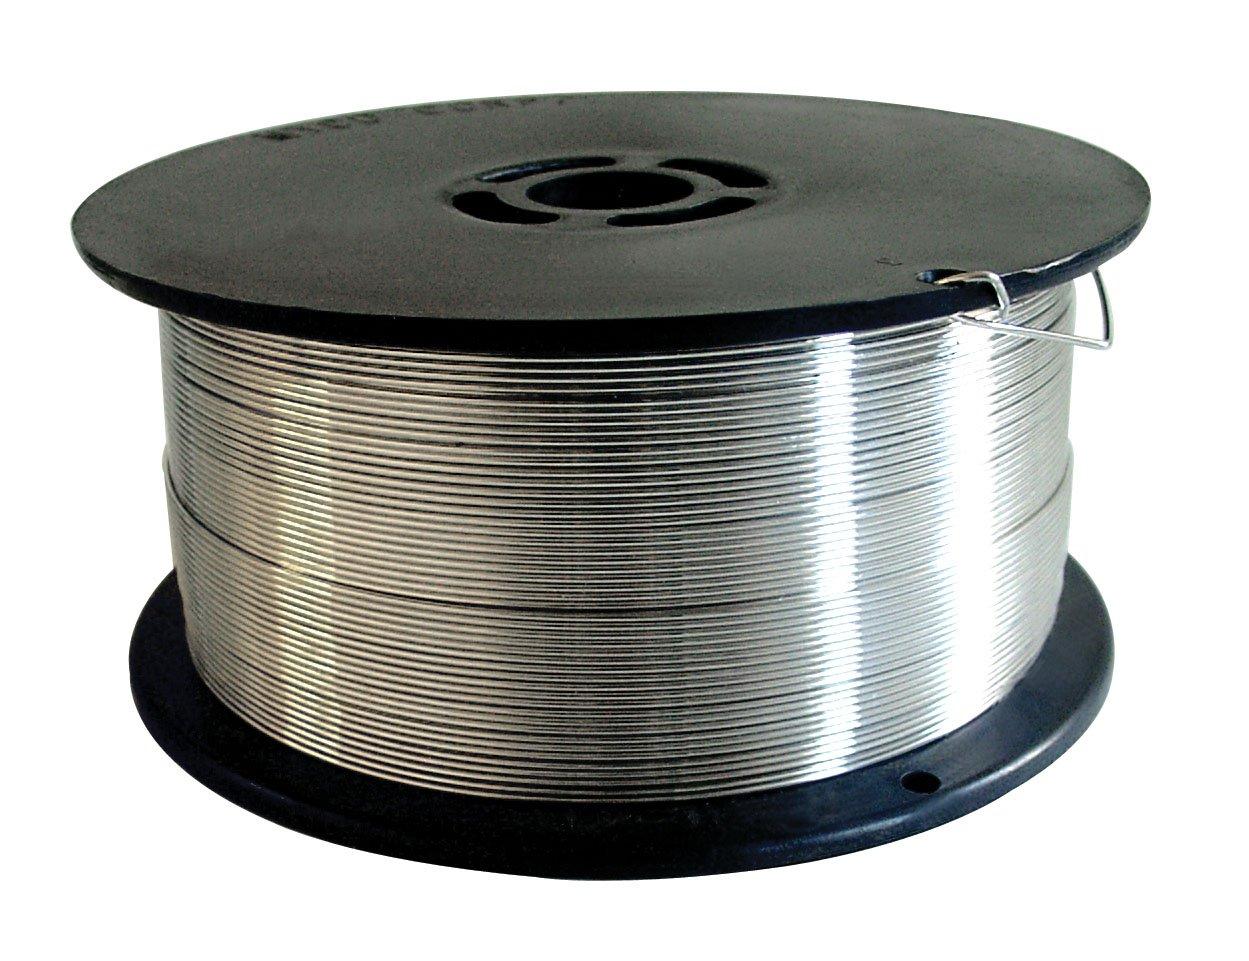 Shark Shark 12042 ER4043 Aluminum MIG Wire Spool, 0.030, 1-Pound